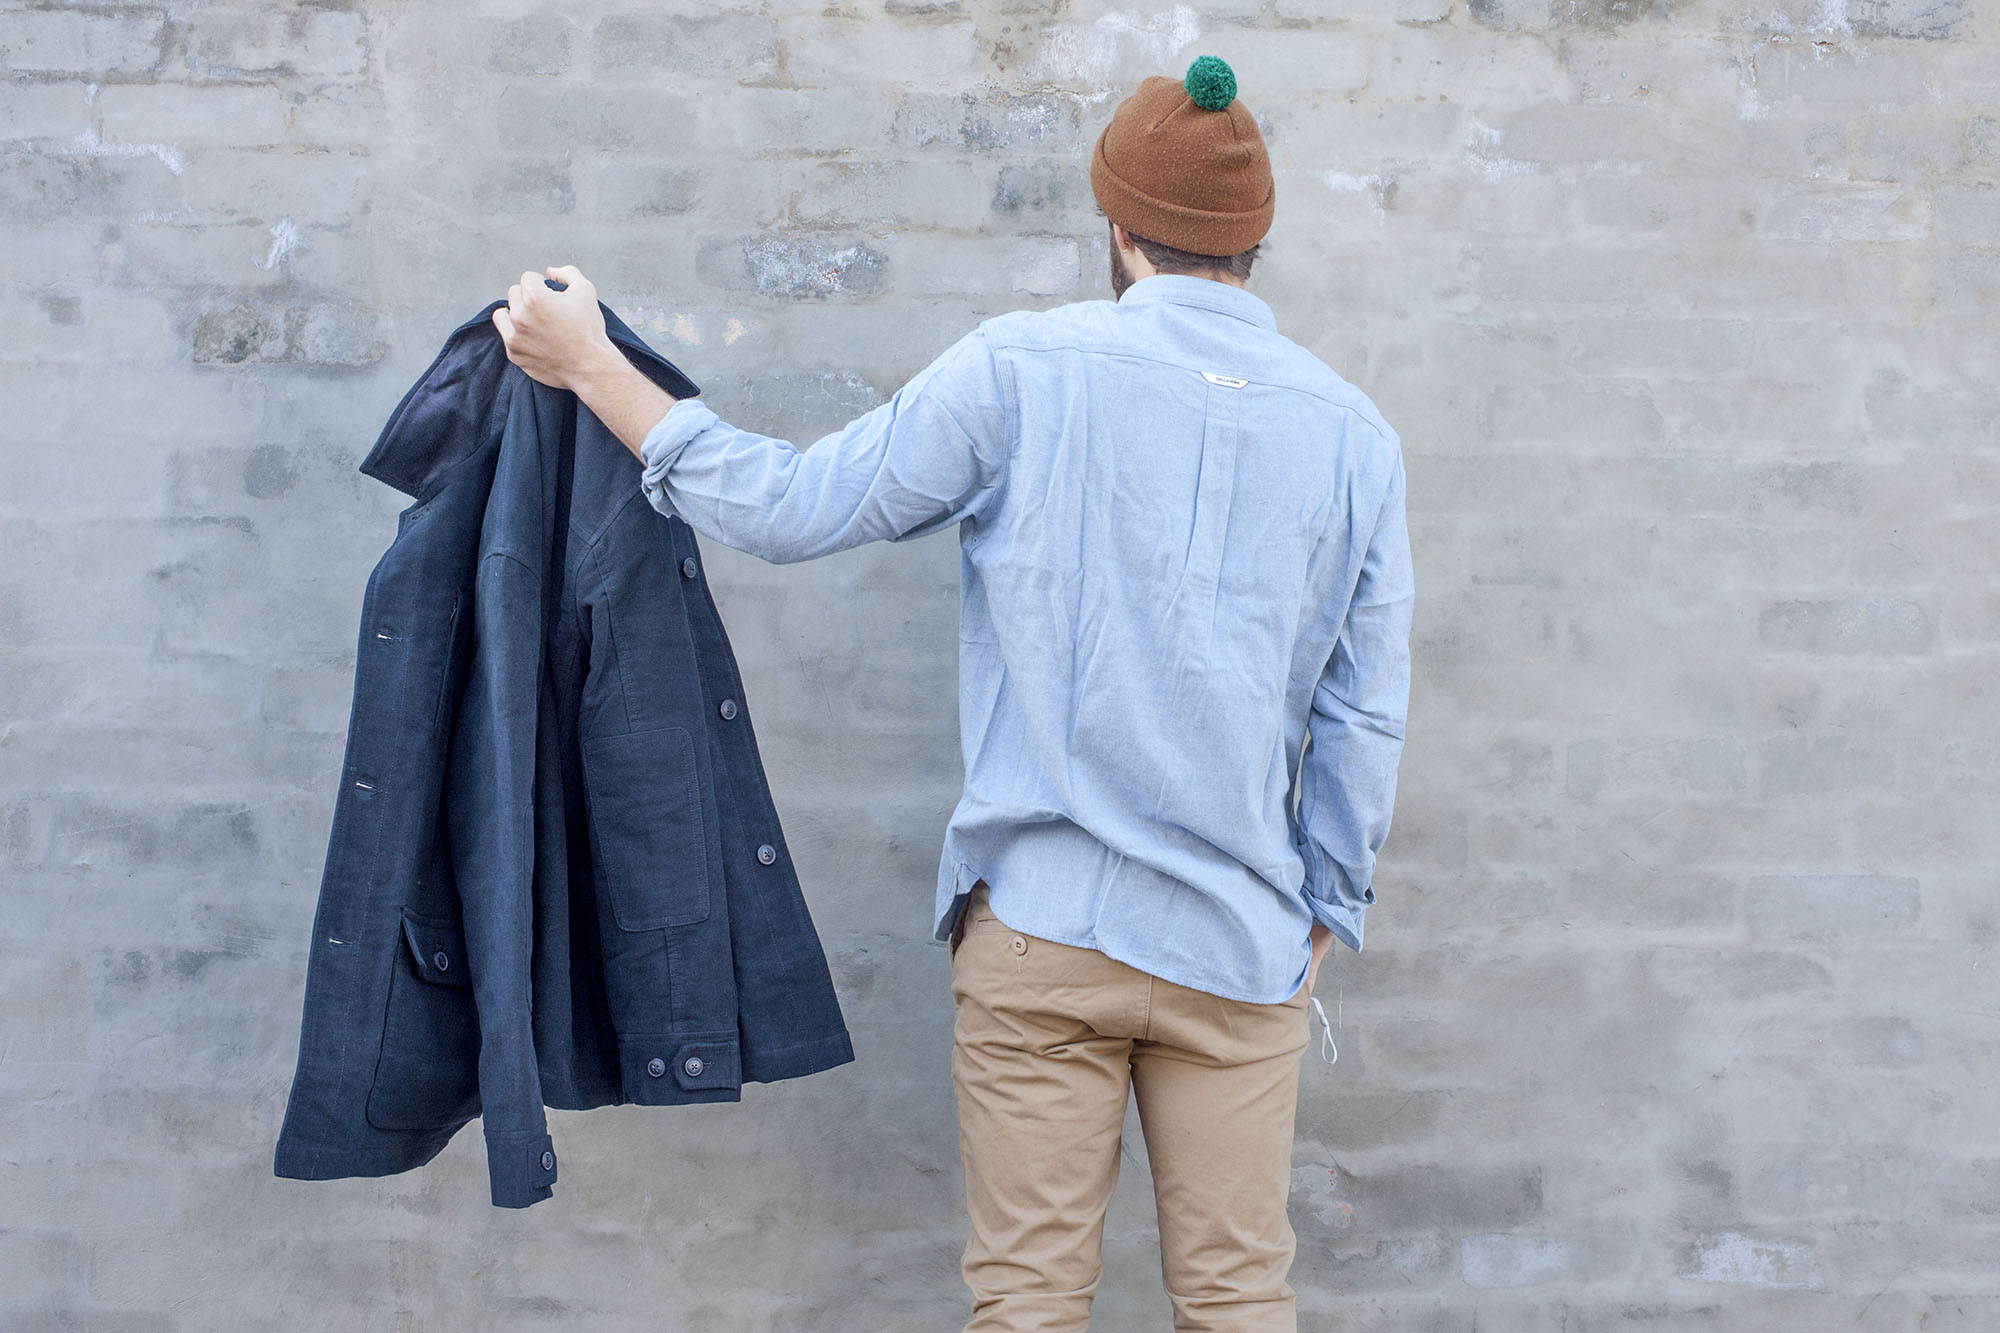 TBP, Tom, Batrouney, Photo, Photograph, Photographer, Photography, Drizabone, Portrait, People, Jacket, Fashion, Commercial, Jumper, Knitted, Knit, Face, Man, Menswear, Outerwear, Shoot, Photoshoot, Jacket, Streetwear